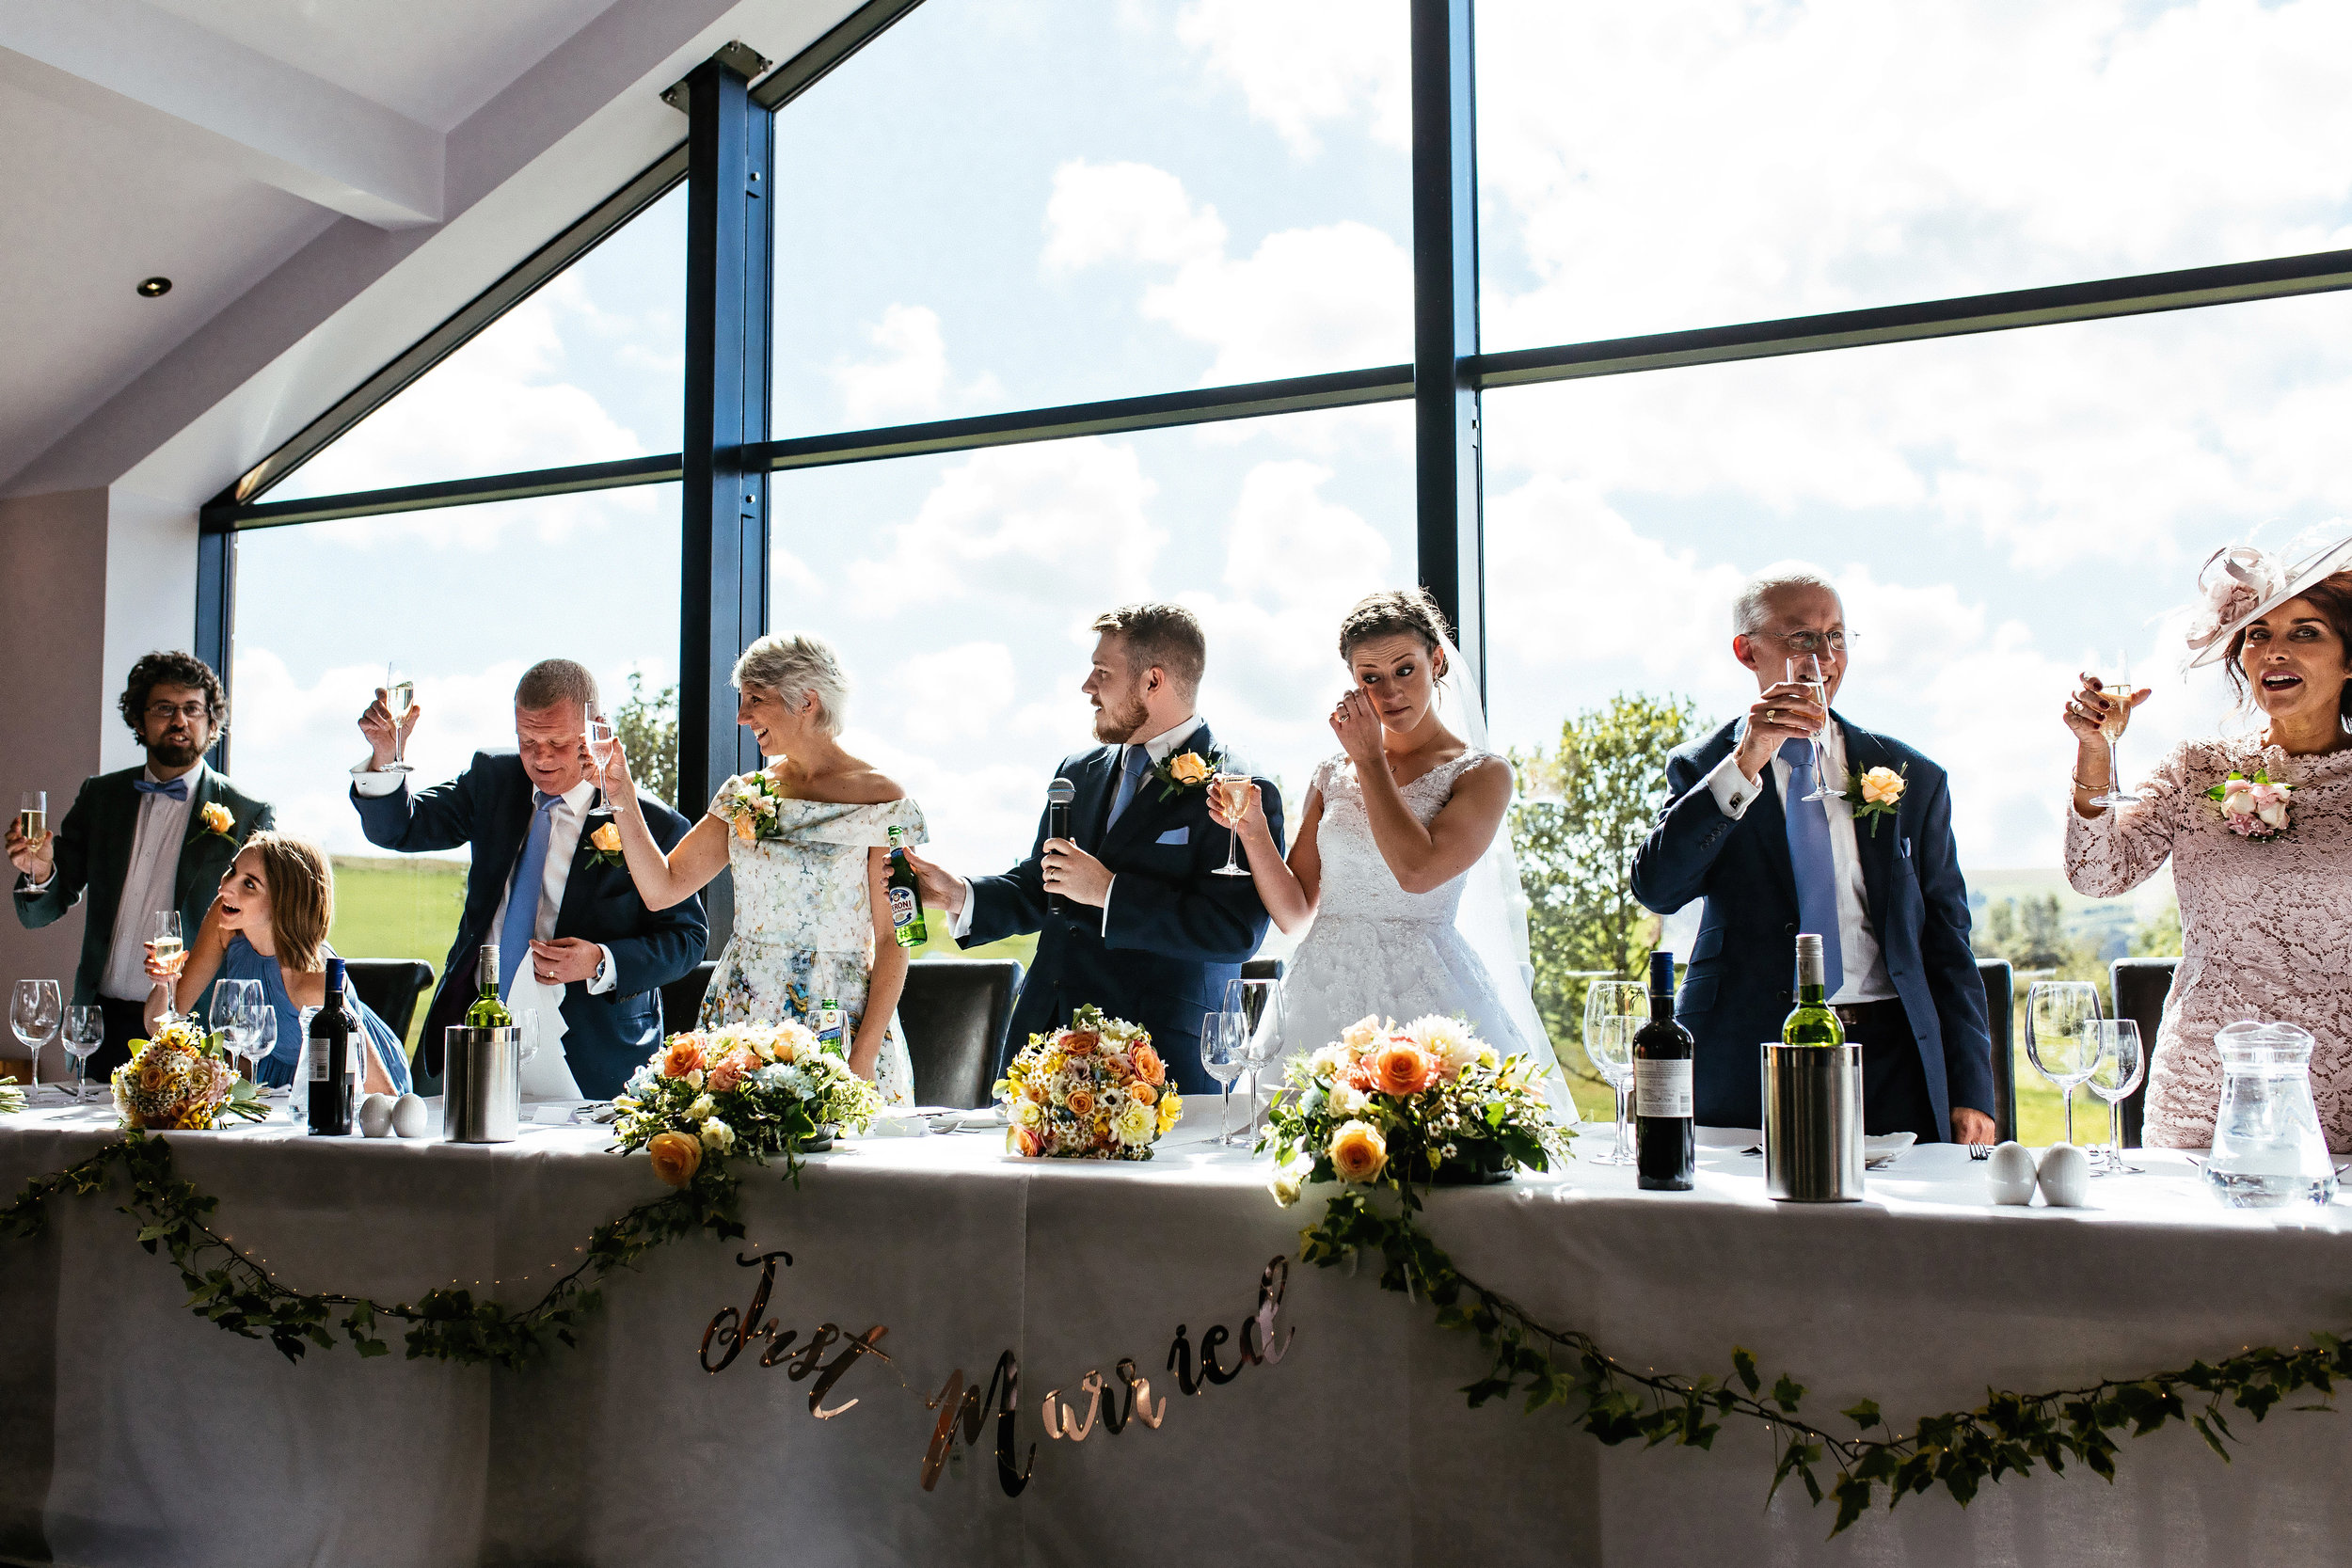 Kathryn-and-Mike-Wedding-Highlights-83.jpg